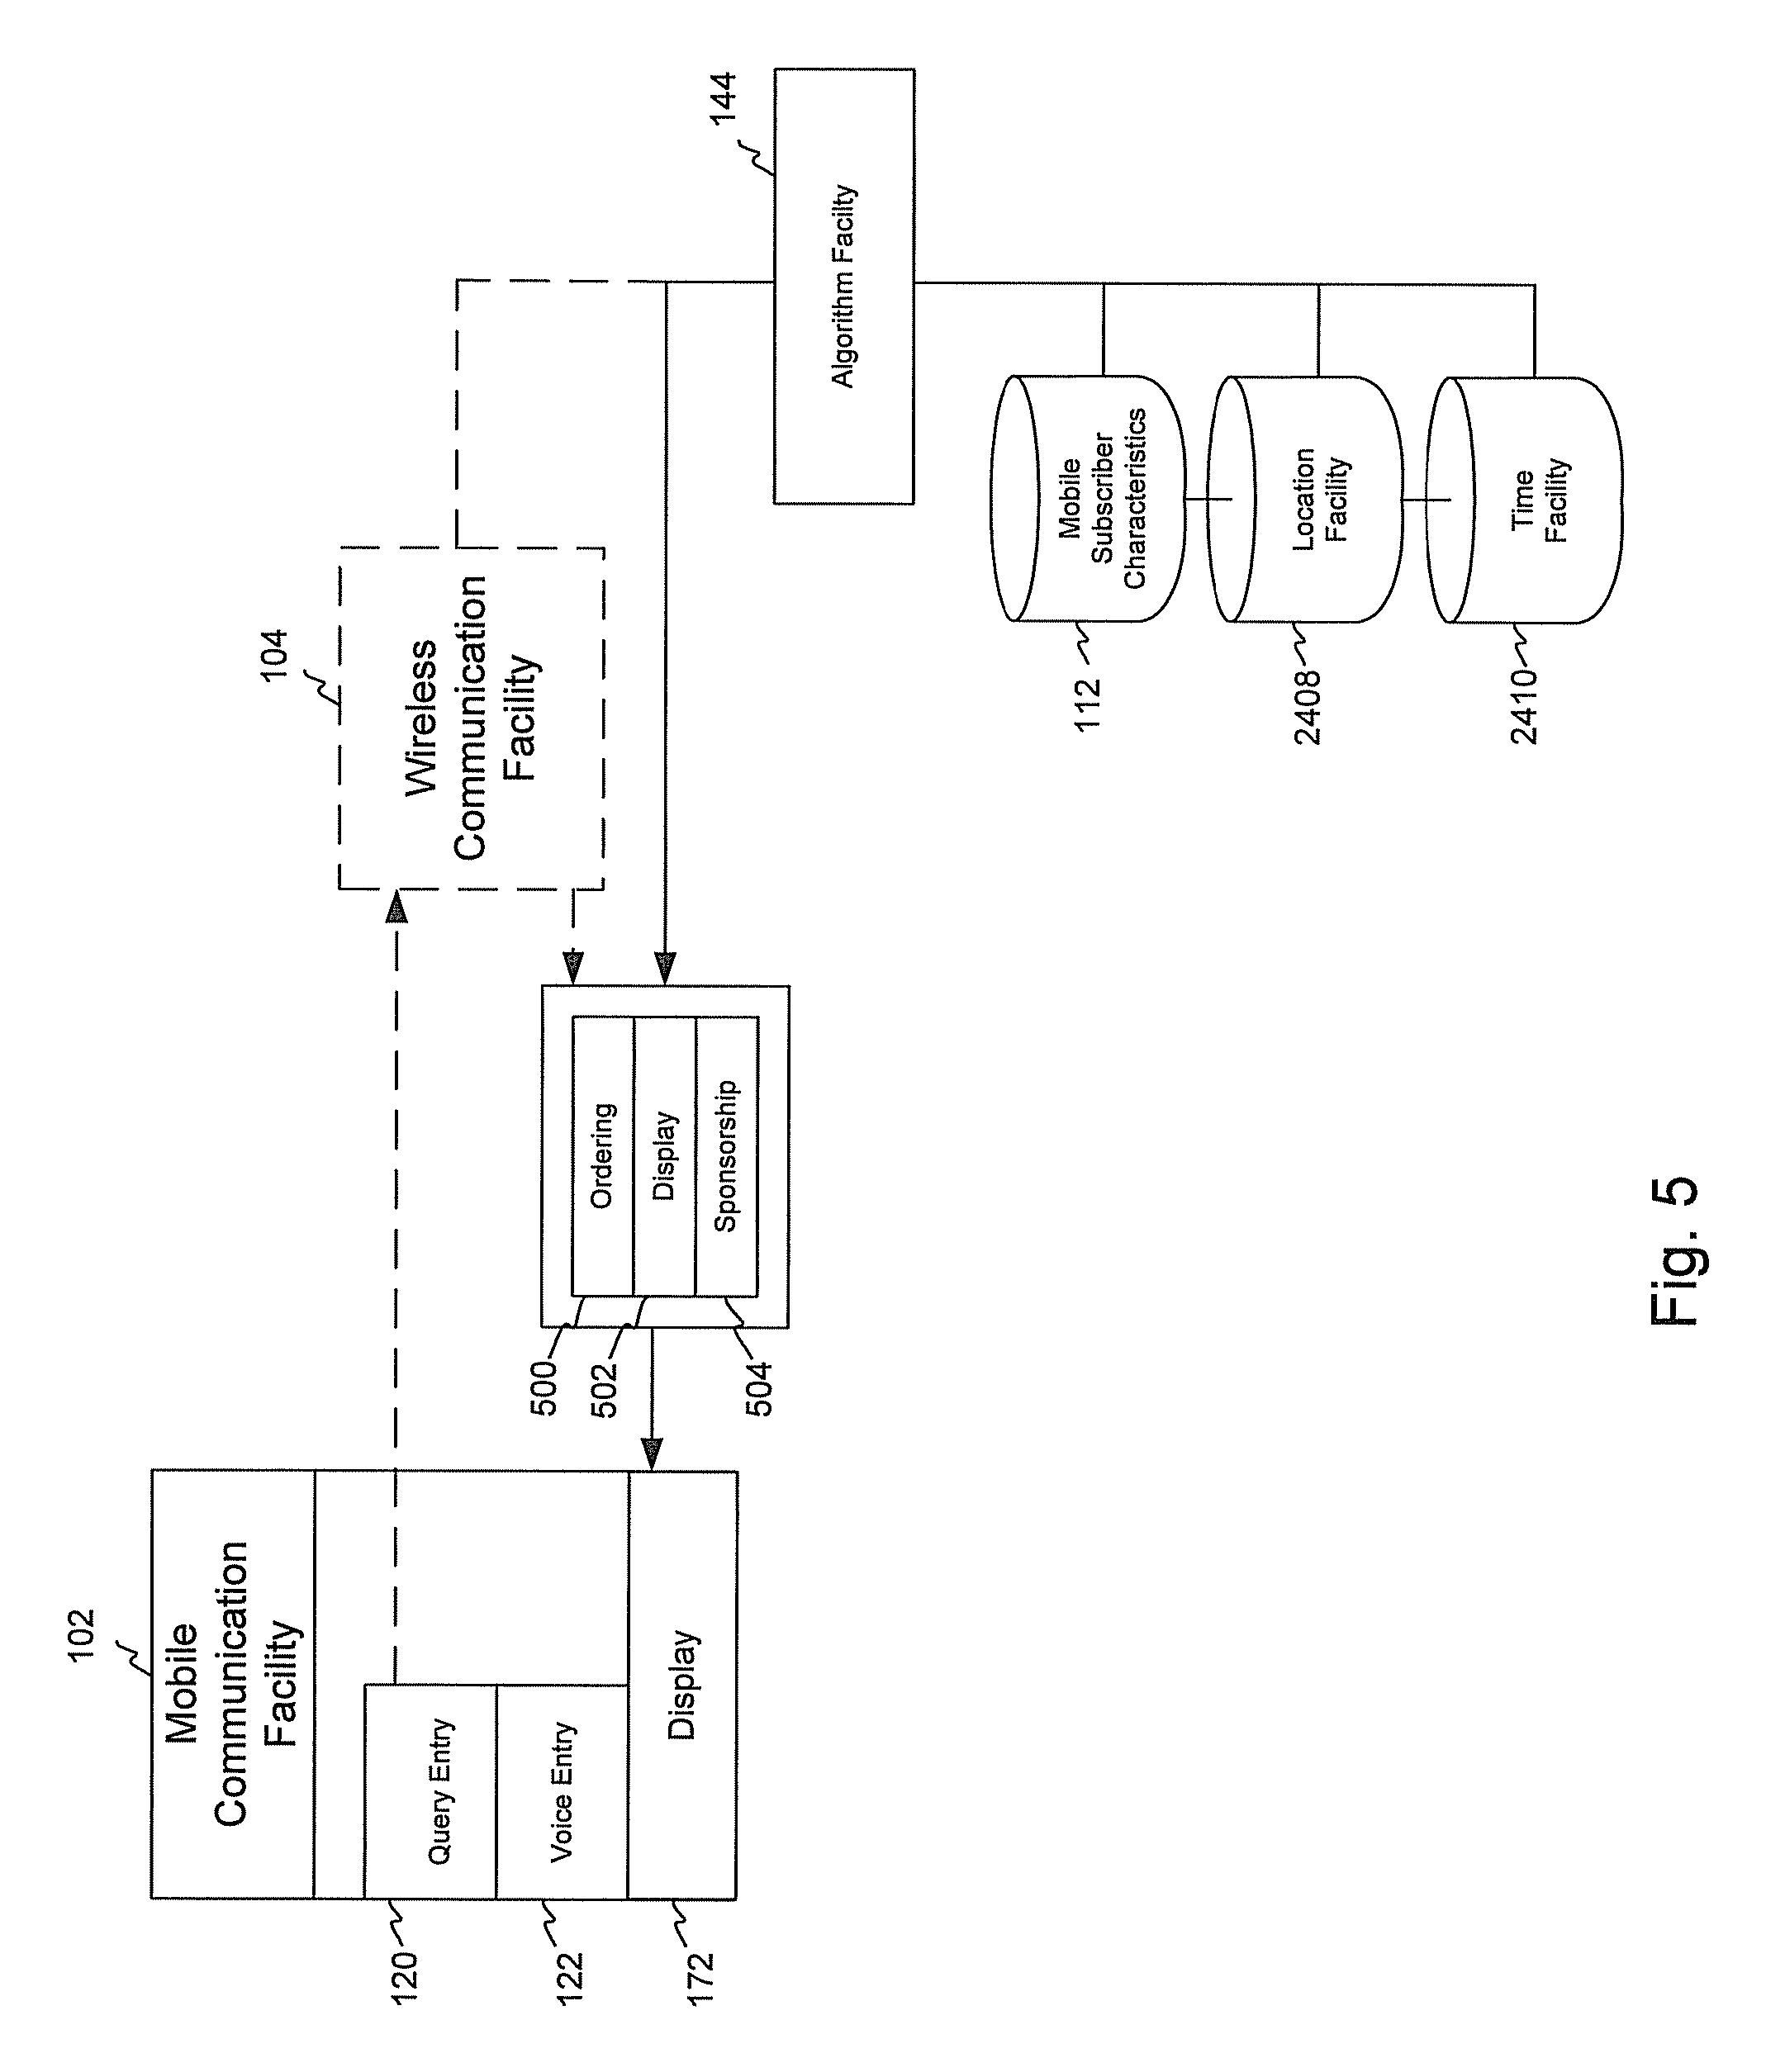 Patent Us 9058406 B2 Clifford Arrow 3 Wiring Diagram